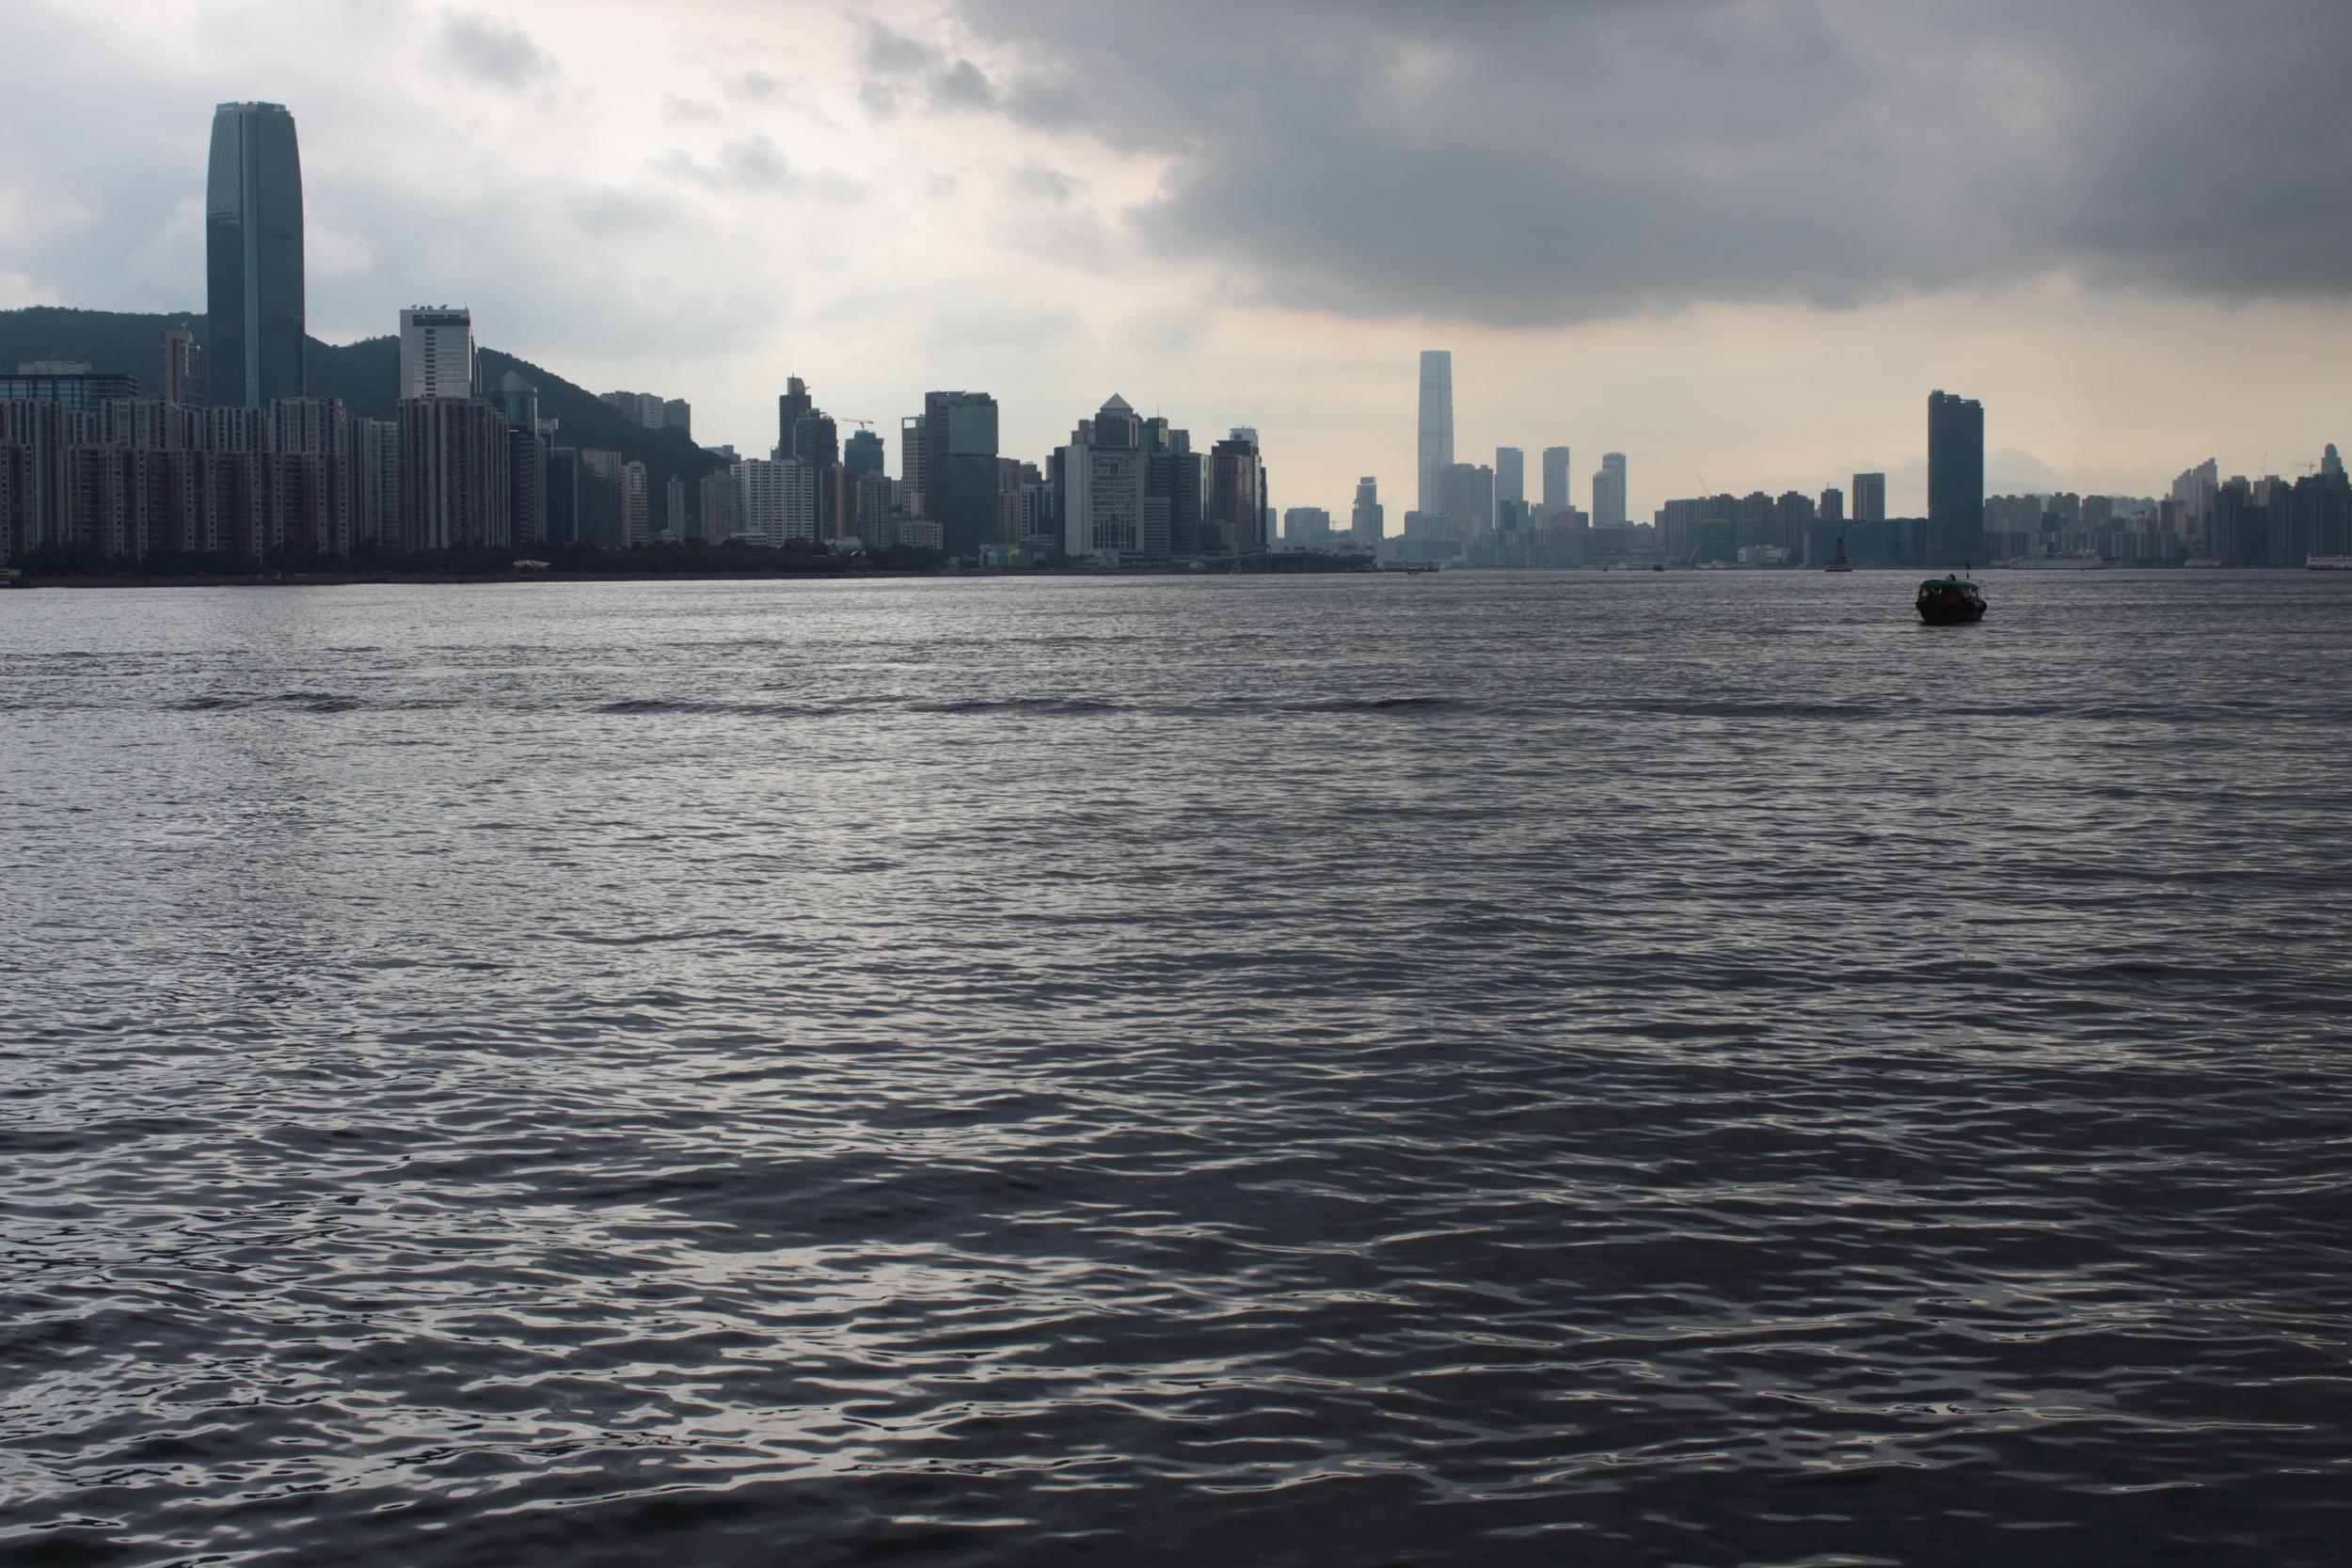 Hong Kong from the Southeast corner